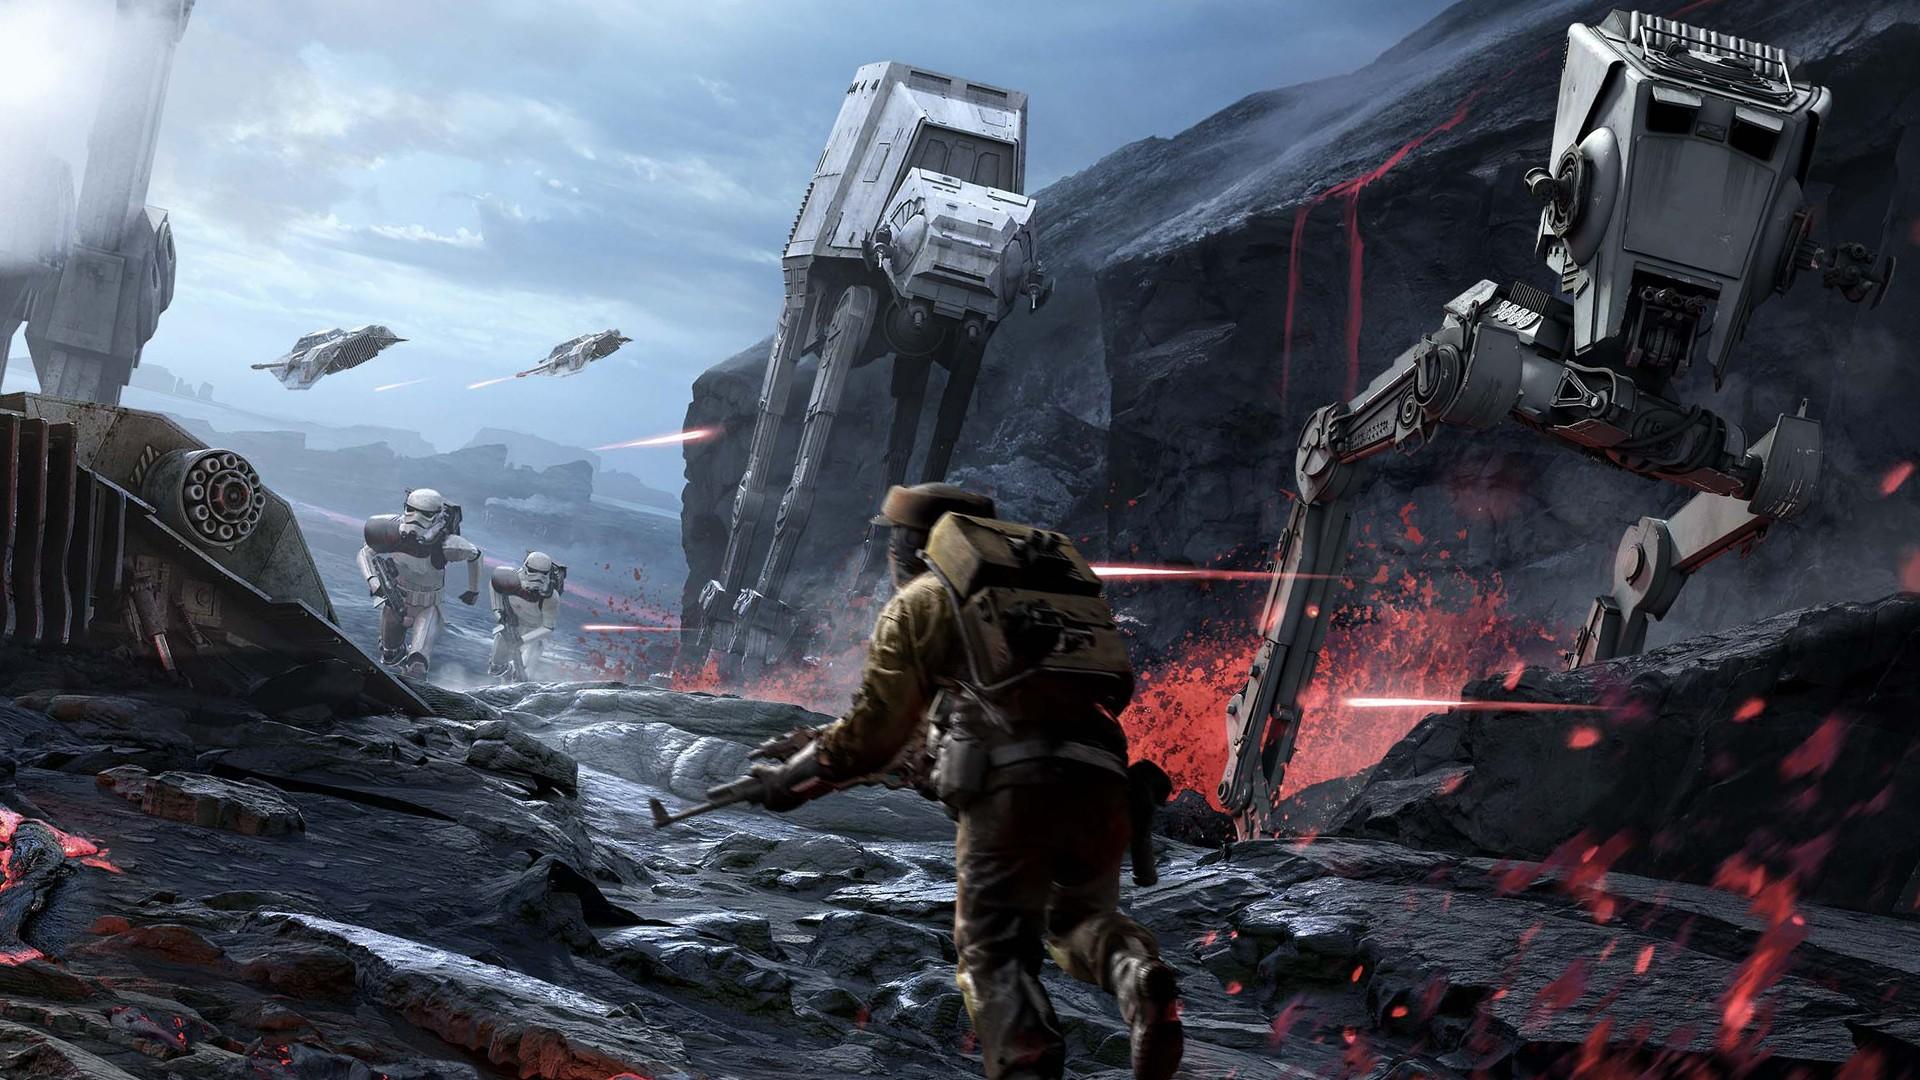 Star Wars Battlefront Wallpapers 1080p - WallpaperSafari